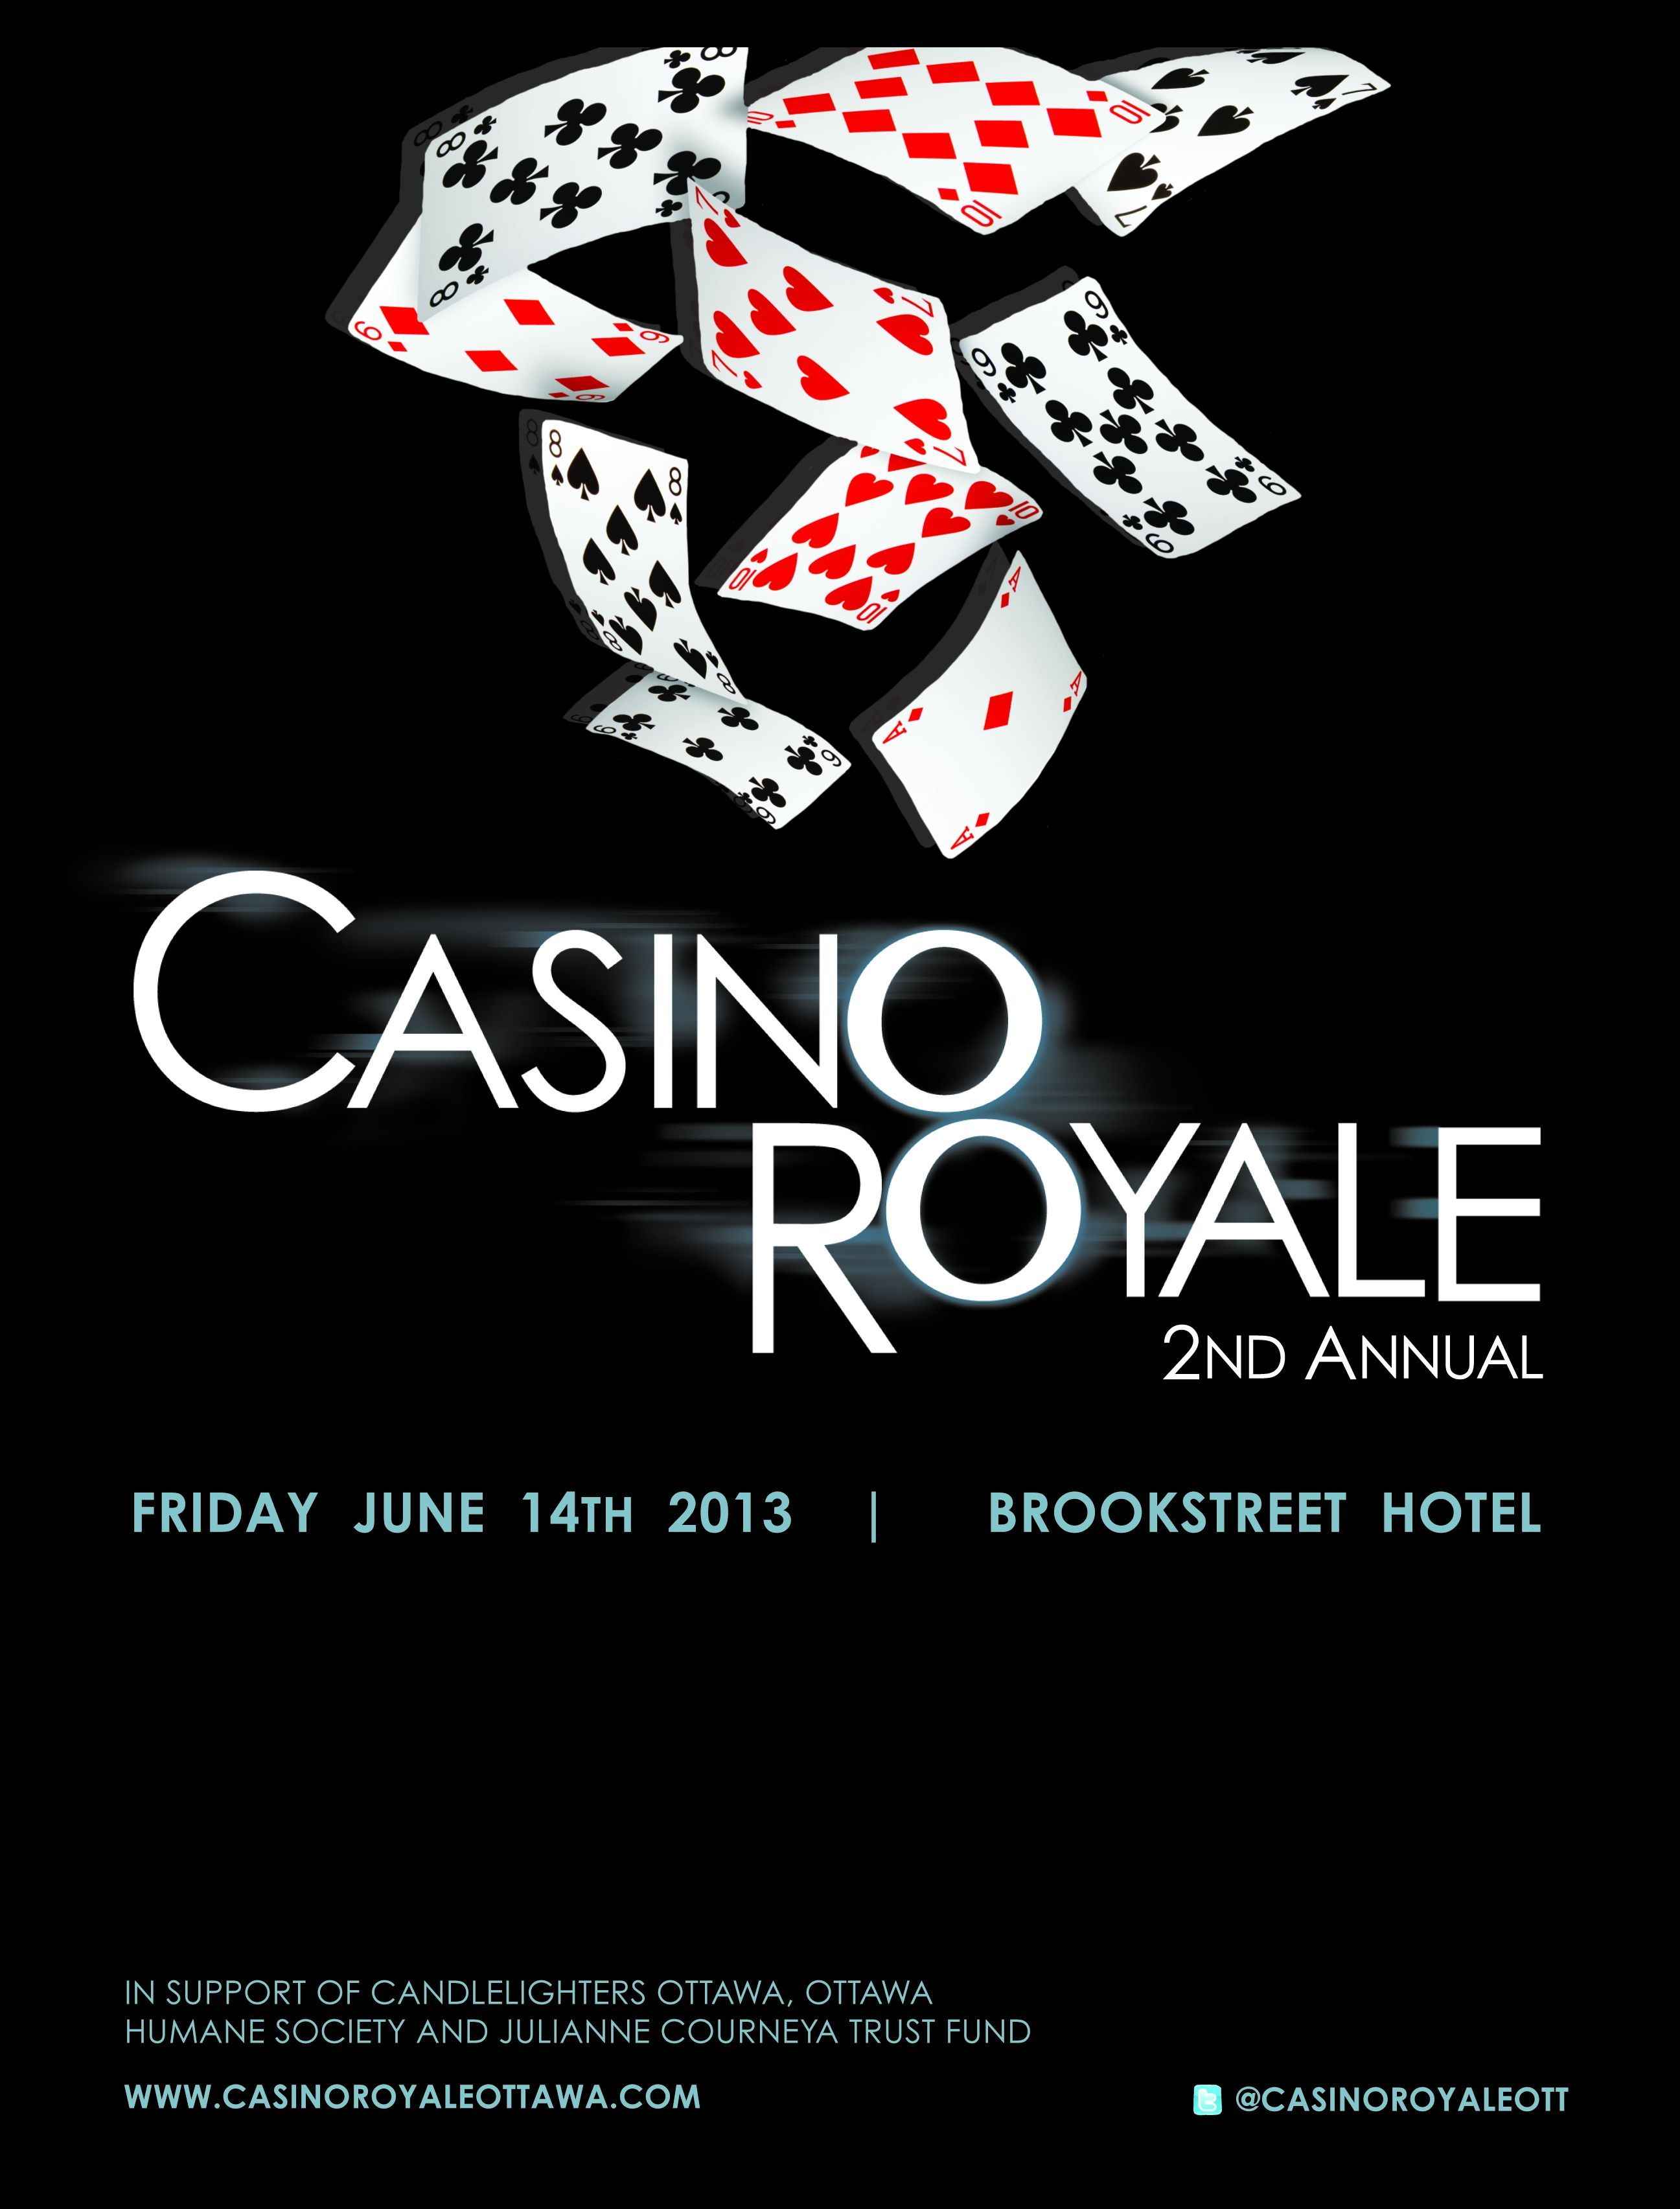 casino royale wallpaper poster - photo #27